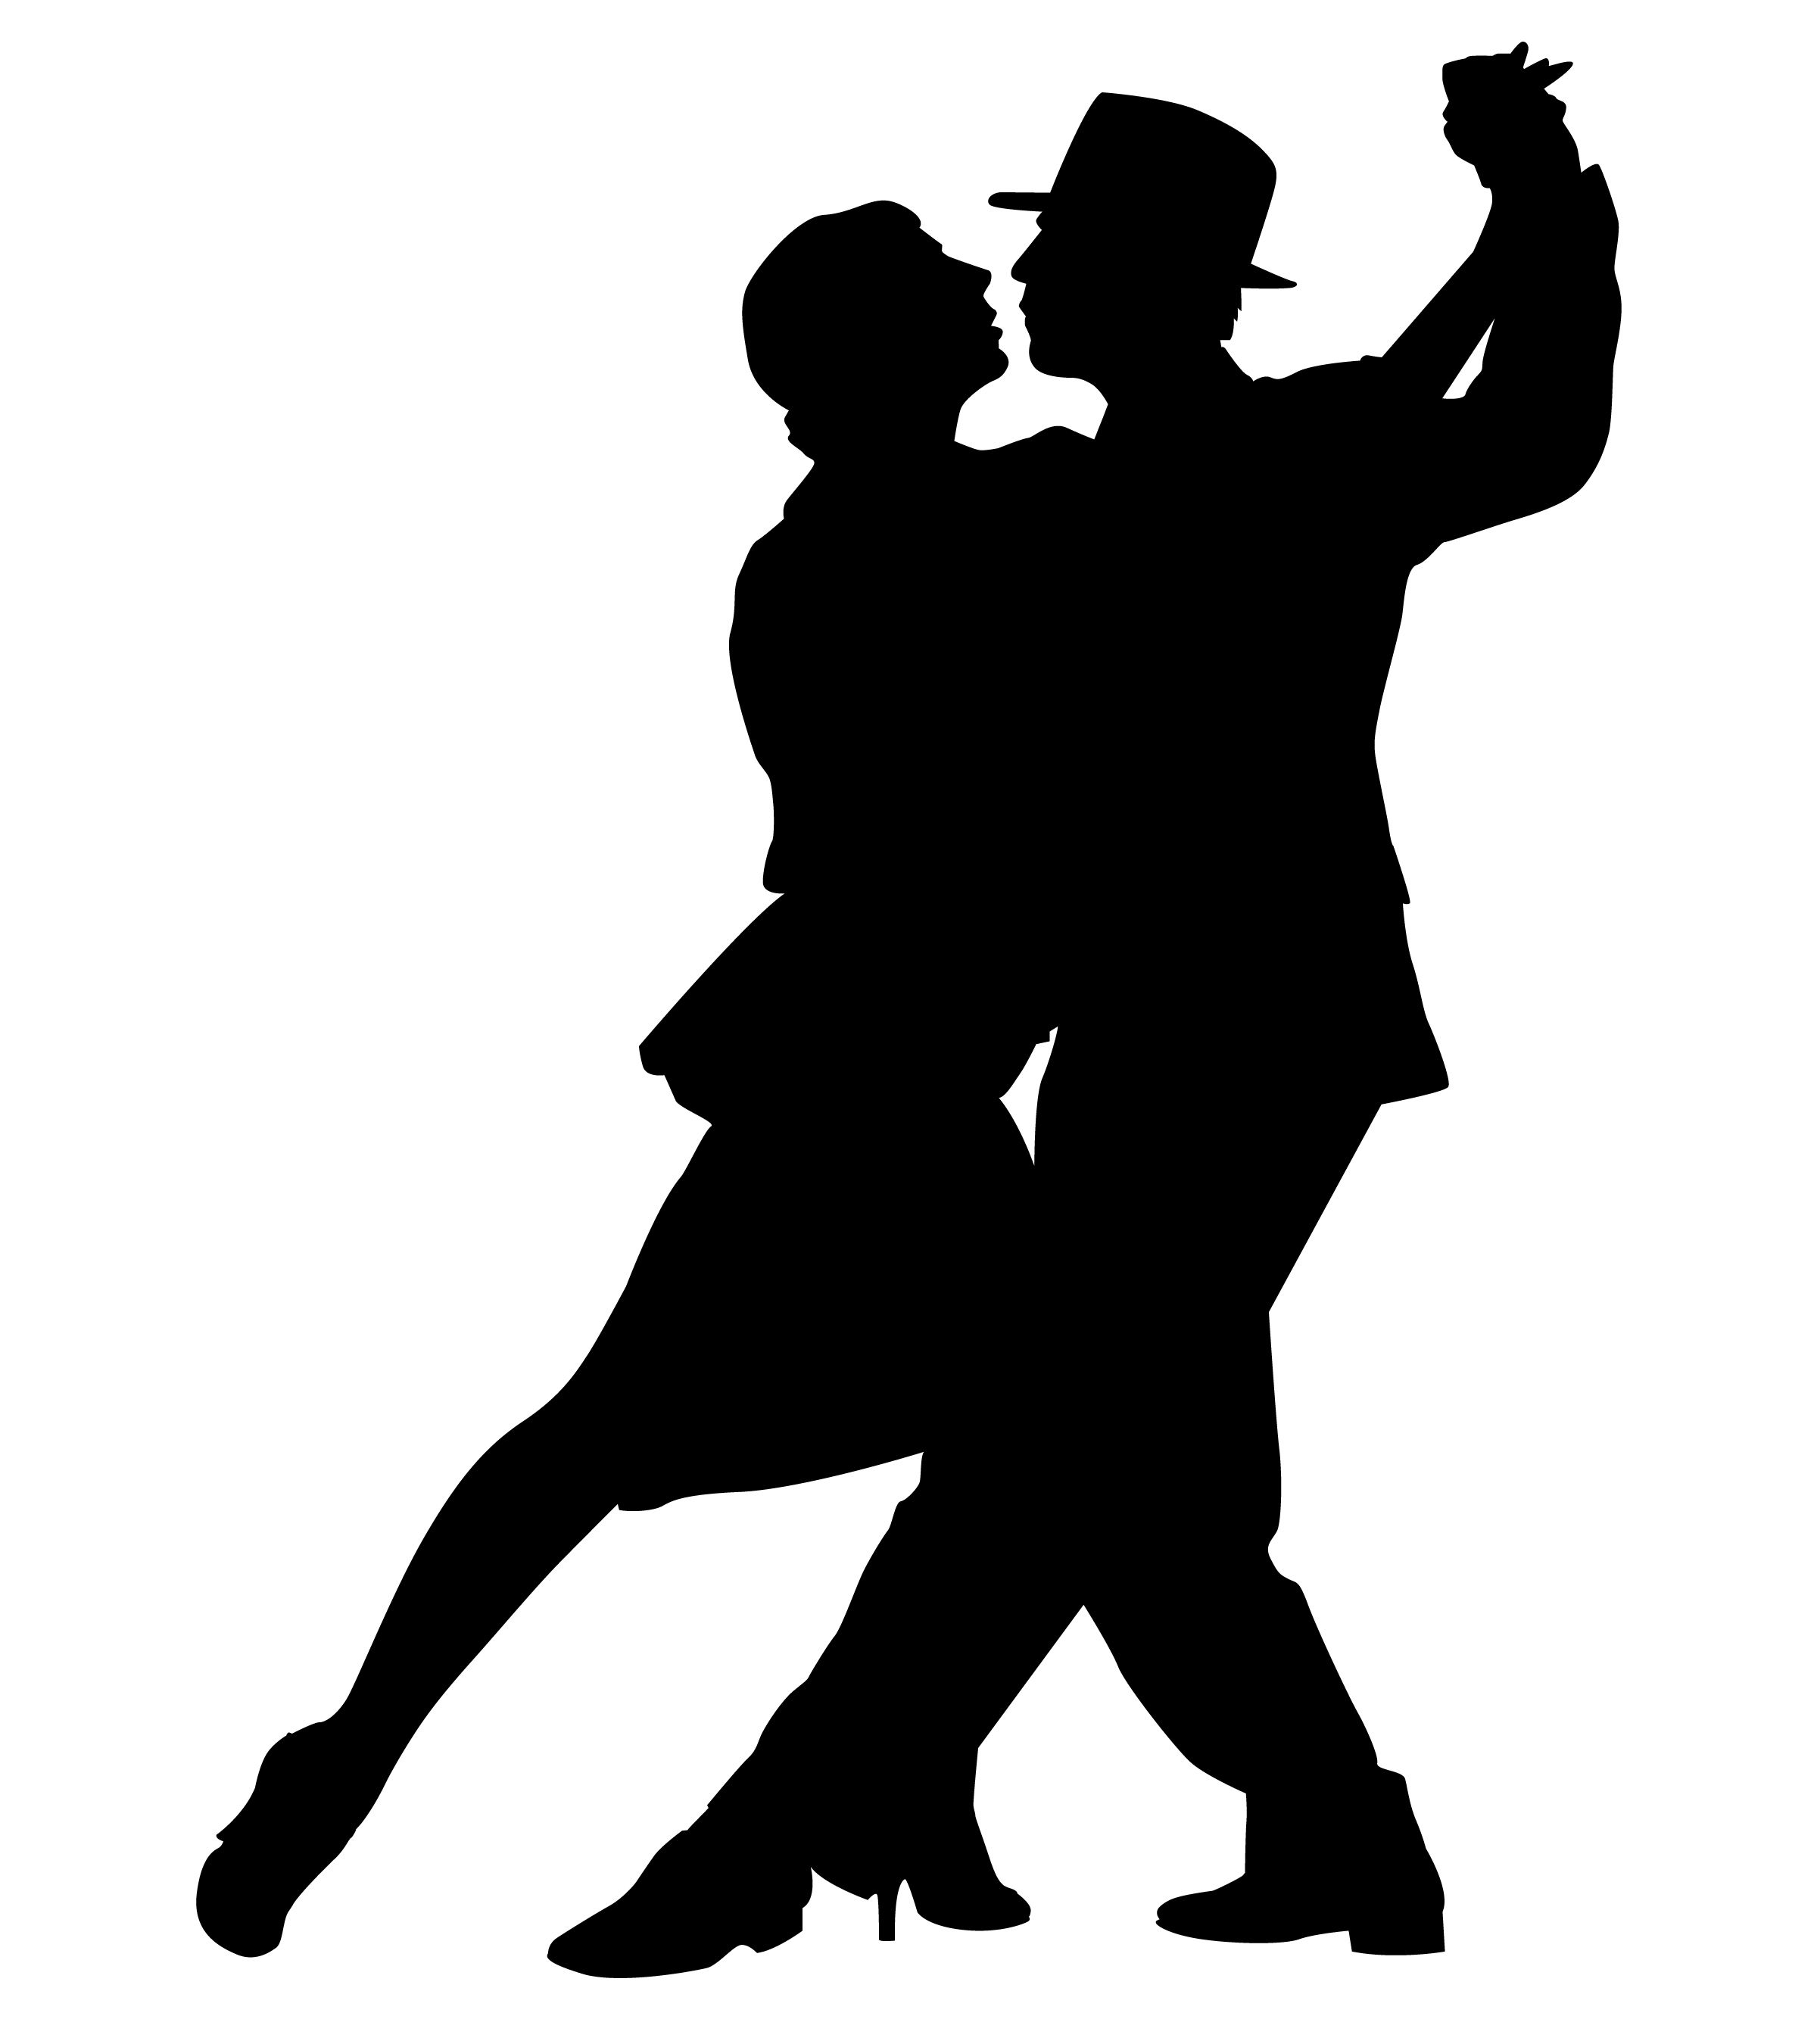 Ballroom Dancing Dancing Couple Silhouette Dancer Silhouette Couple Silhouette